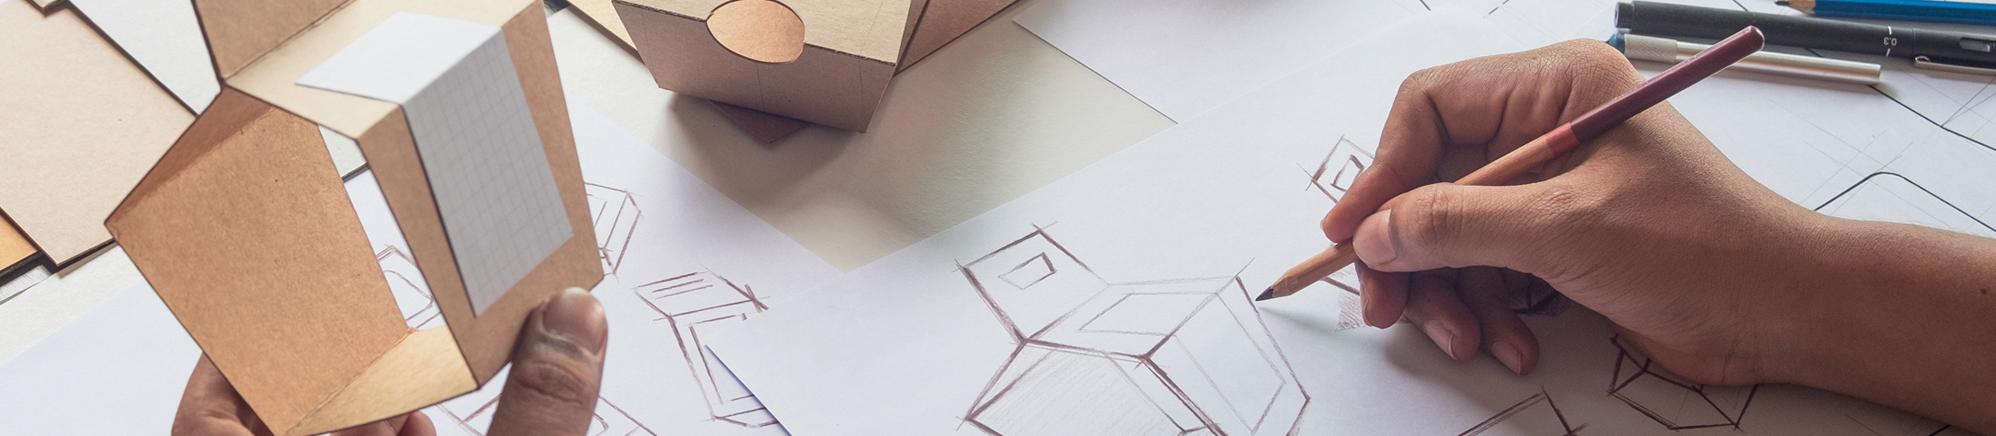 Packaking_Design_goldenhorn